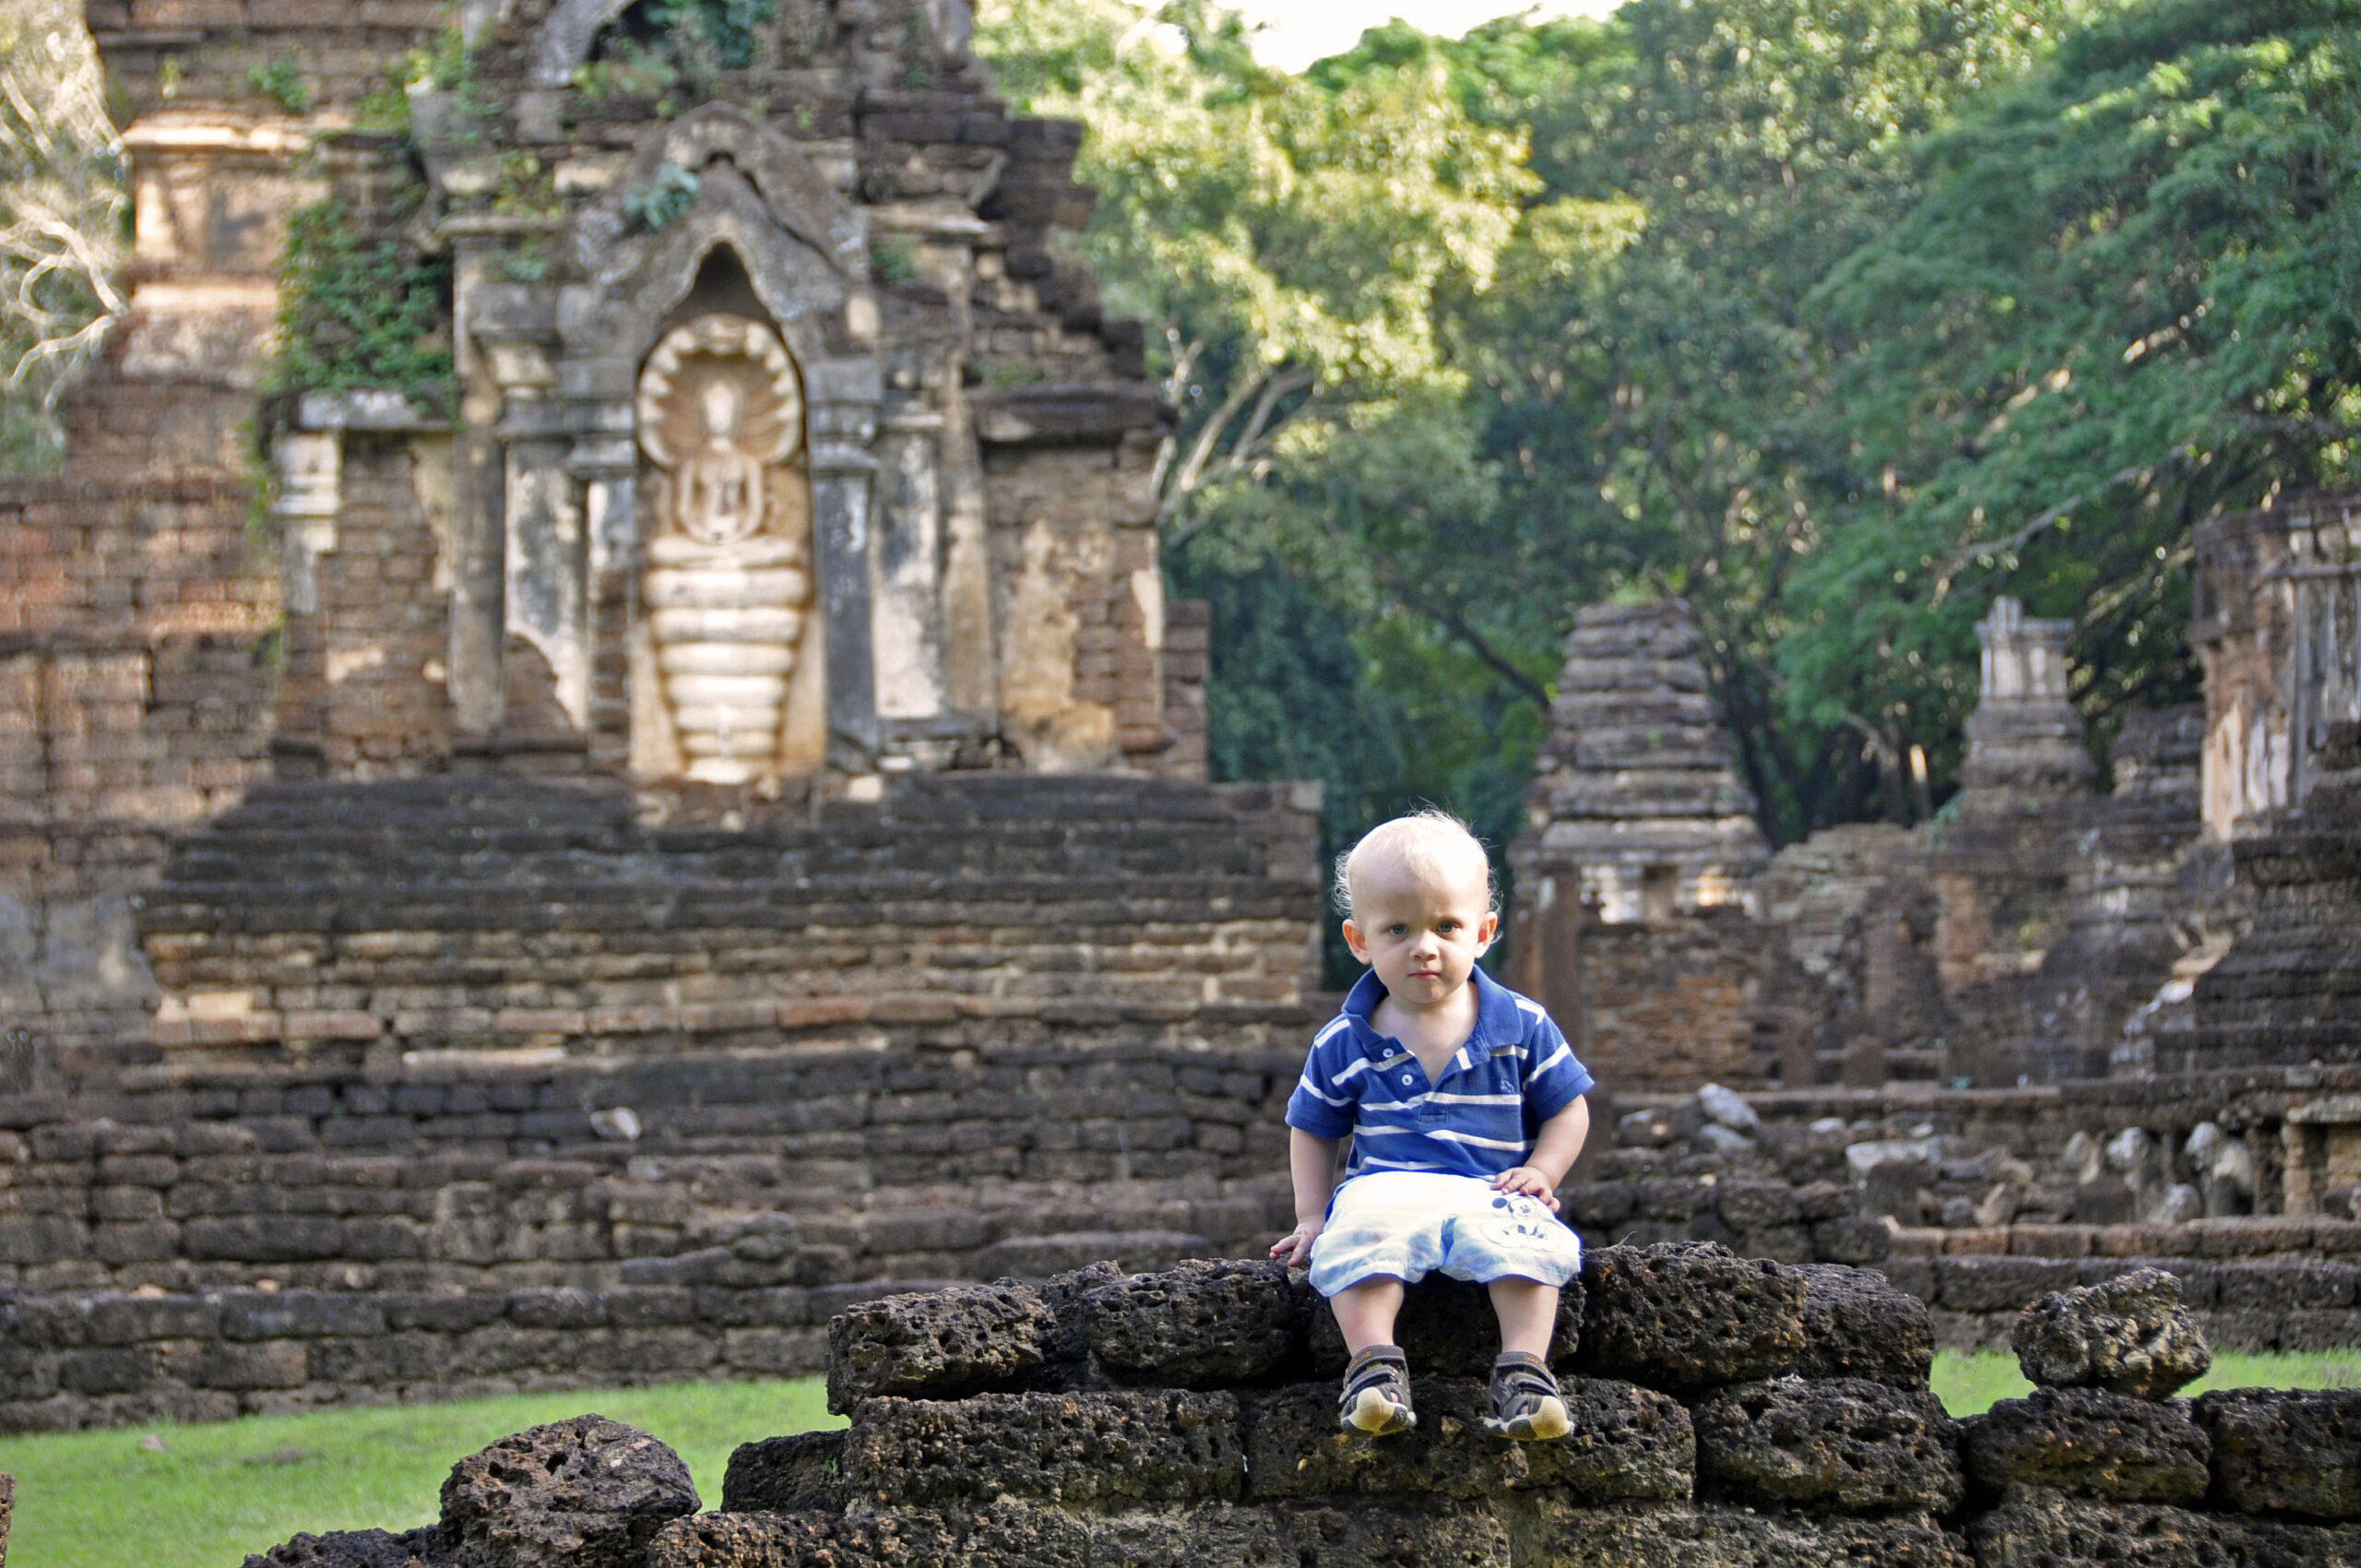 Tajlandia z dzieckiem, Tajlandia 2012